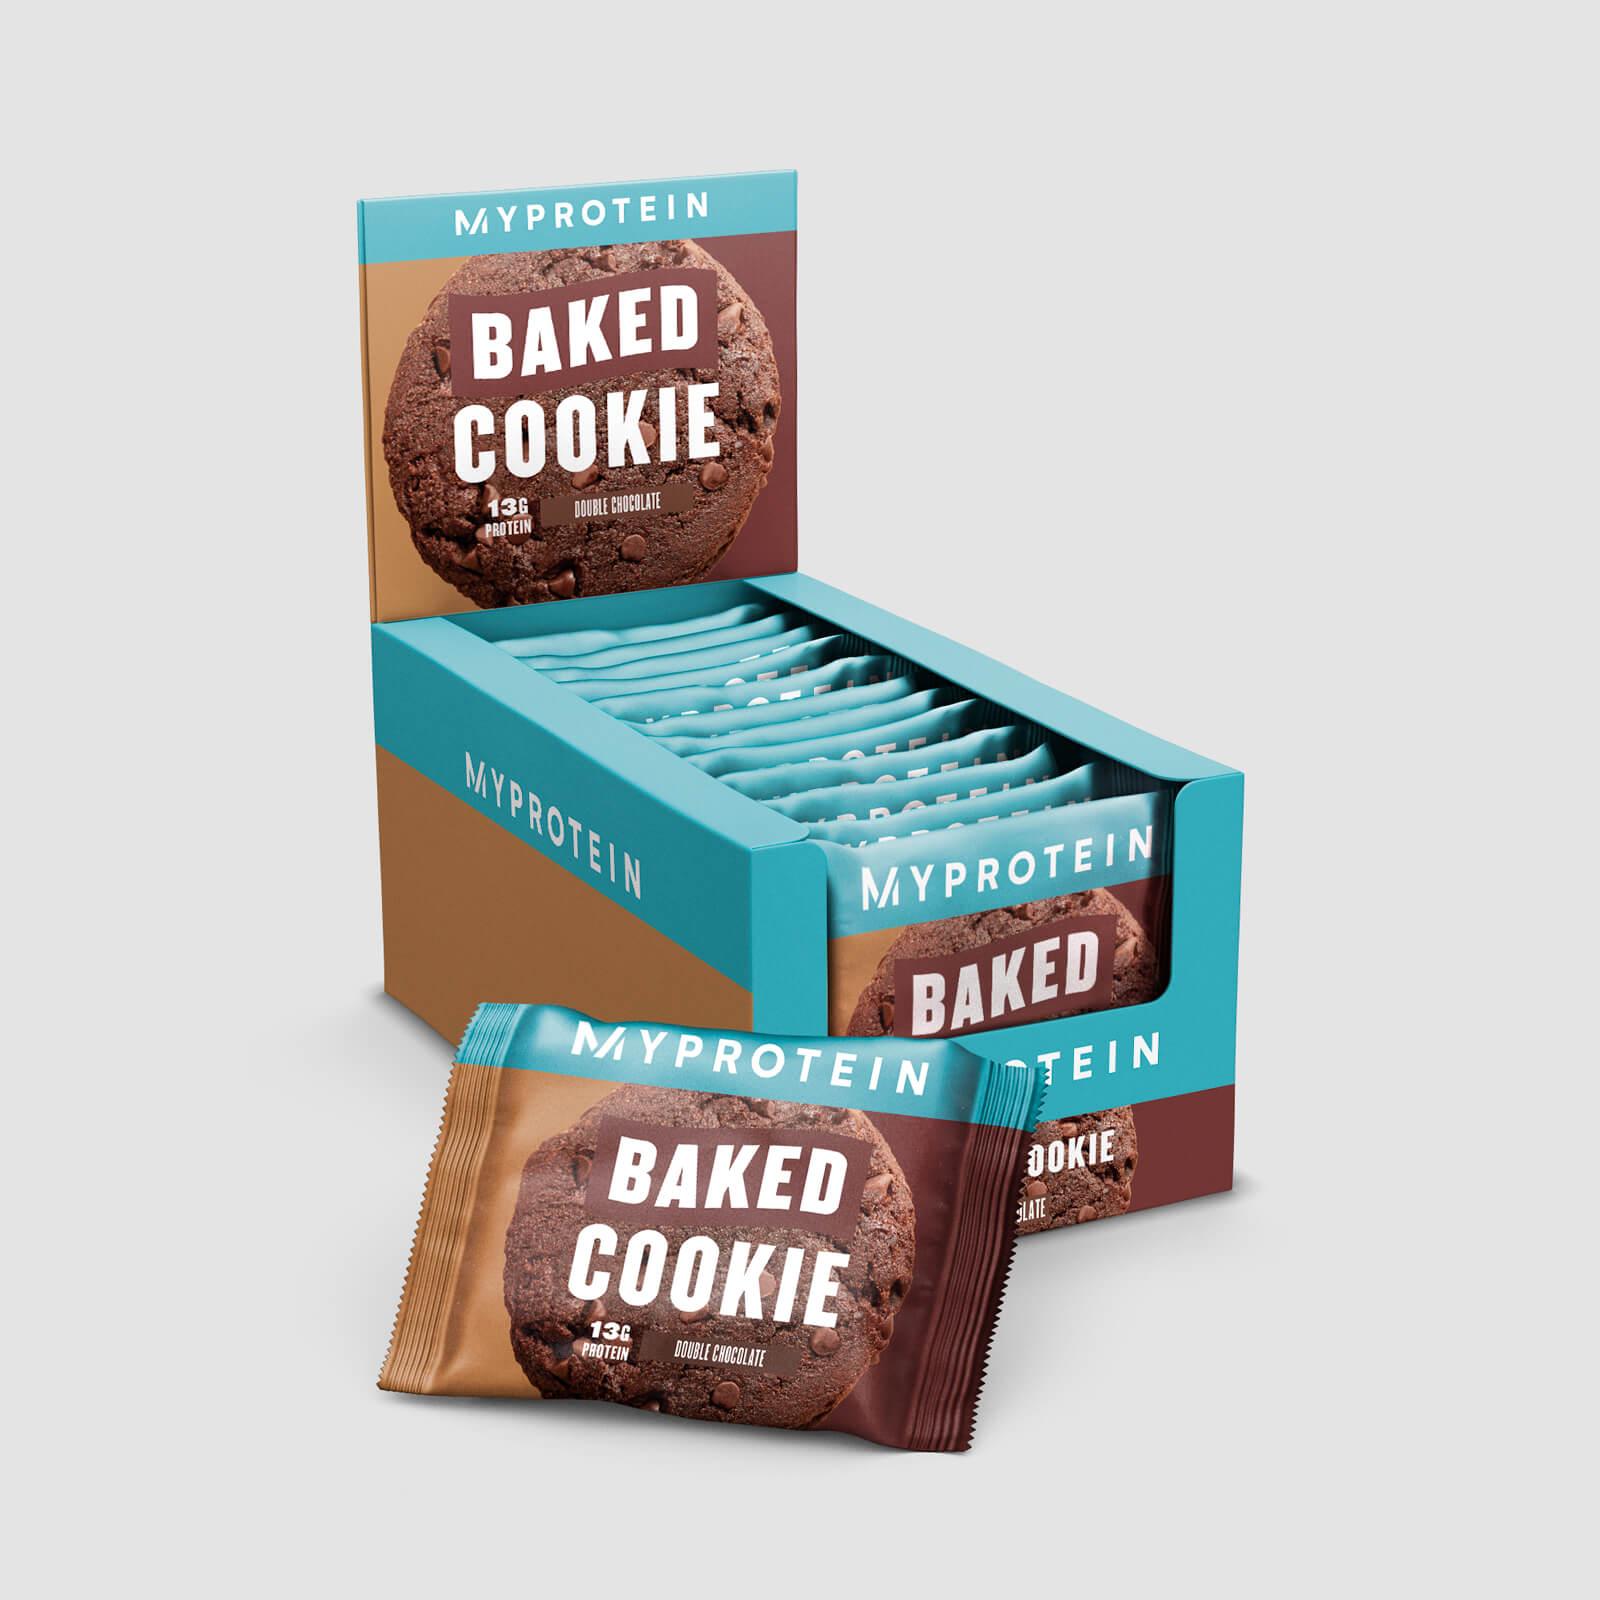 Myprotein Baked Protein Cookie - Chocolate